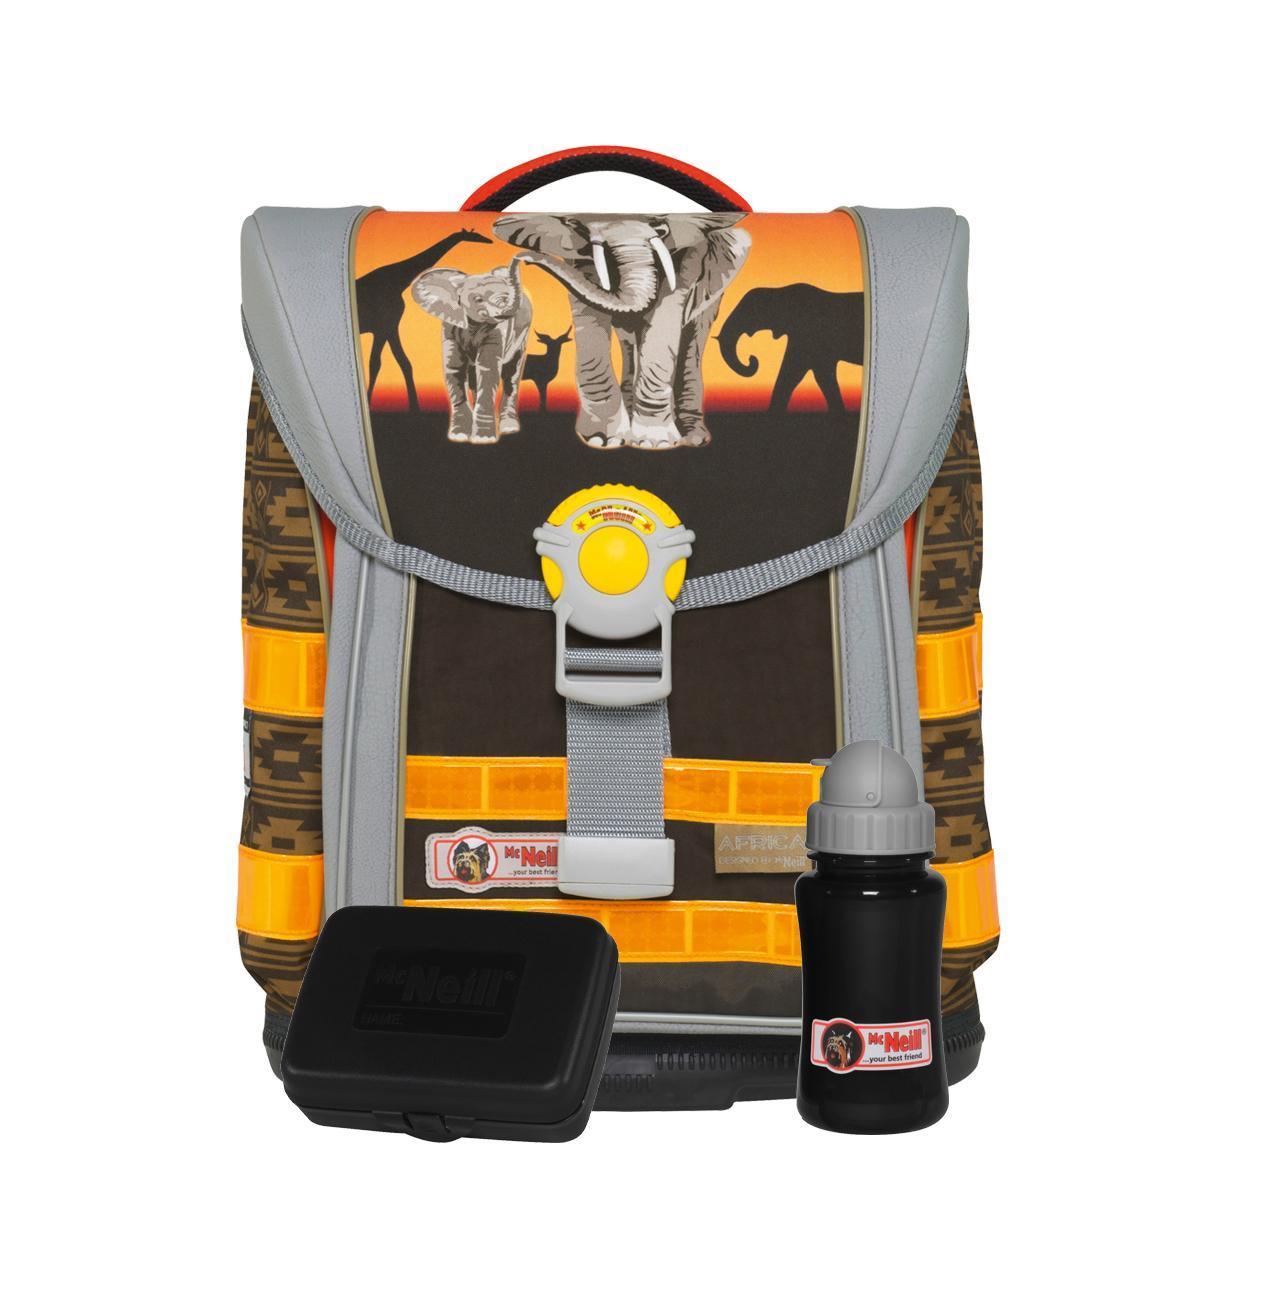 Рюкзак детский McNeill ERGO Light Плюс Африка9598140000